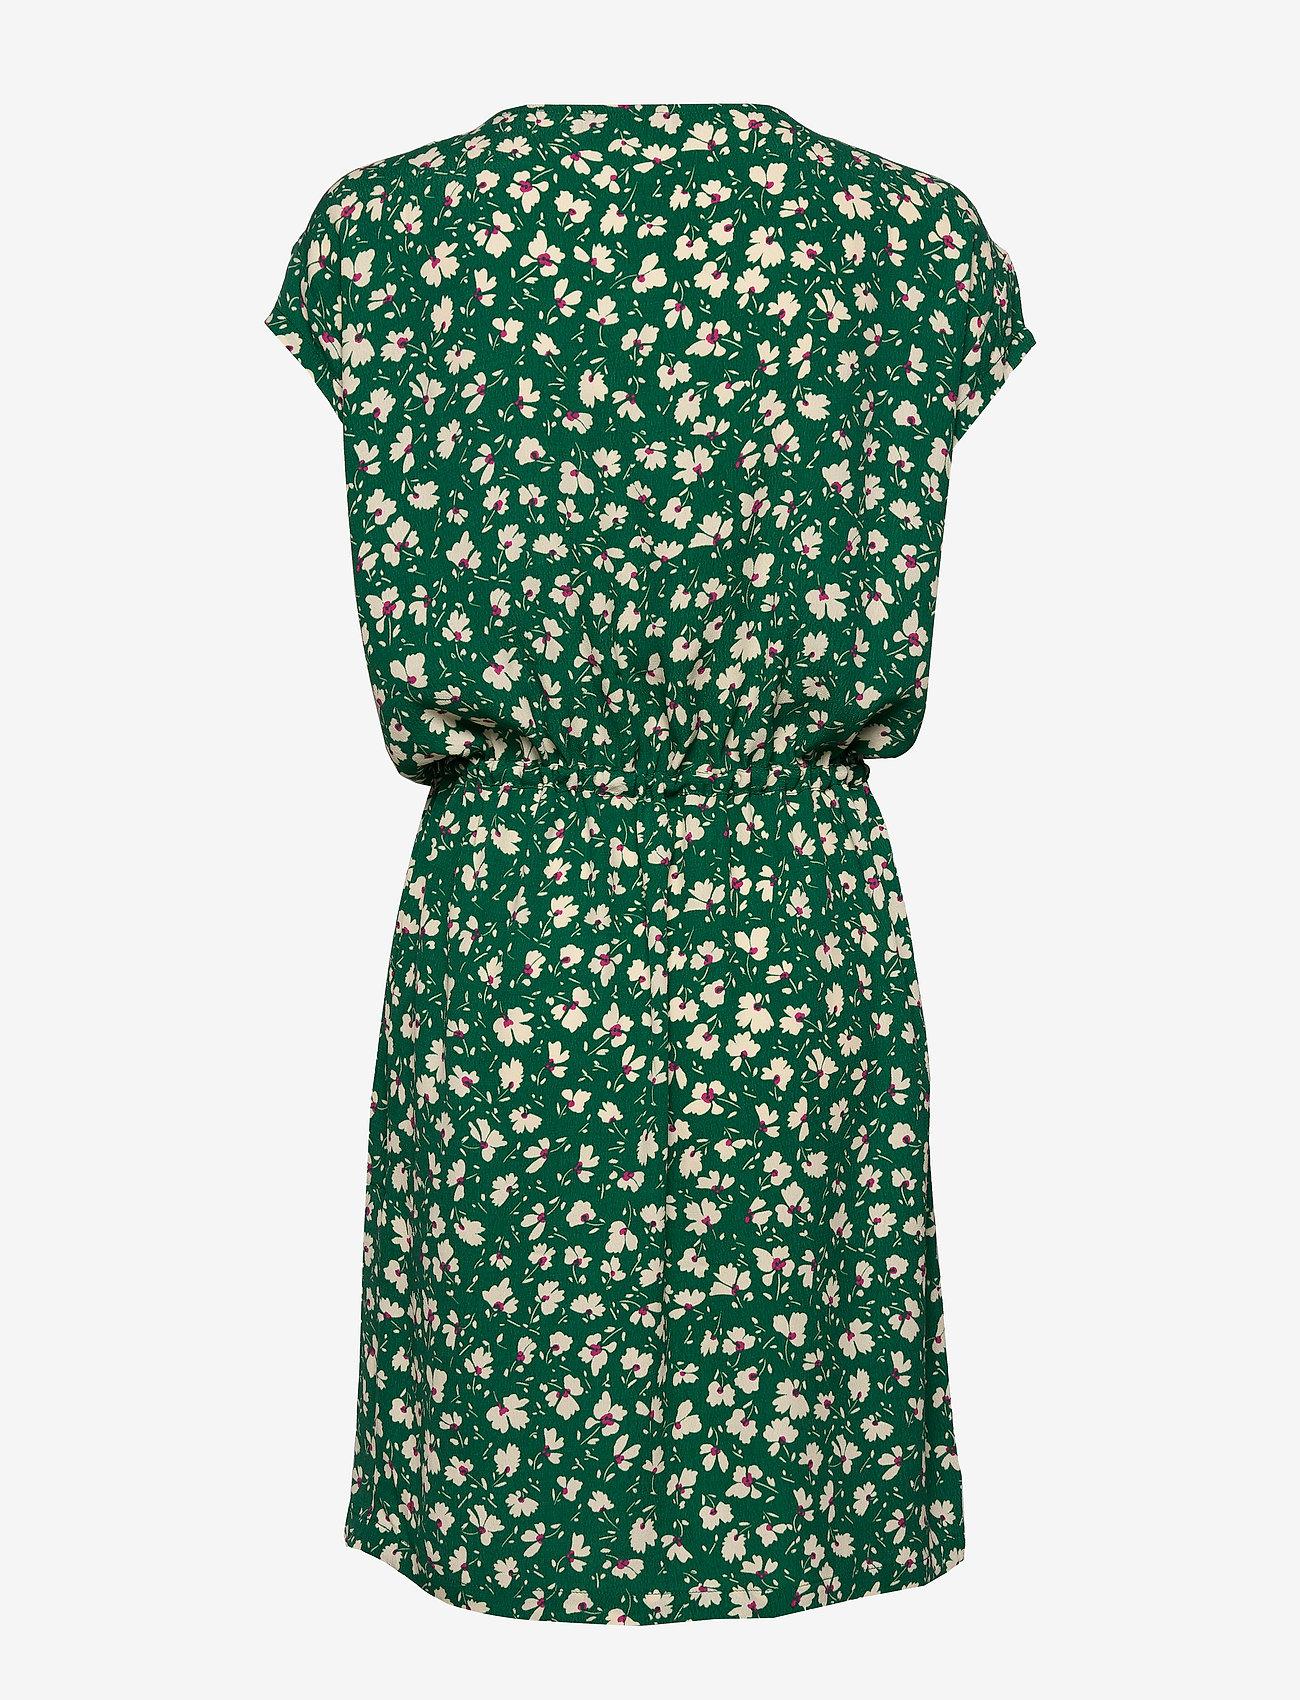 Sl Lavada Dress (Pine Green Flower Print) - Soaked in Luxury BxCqYL